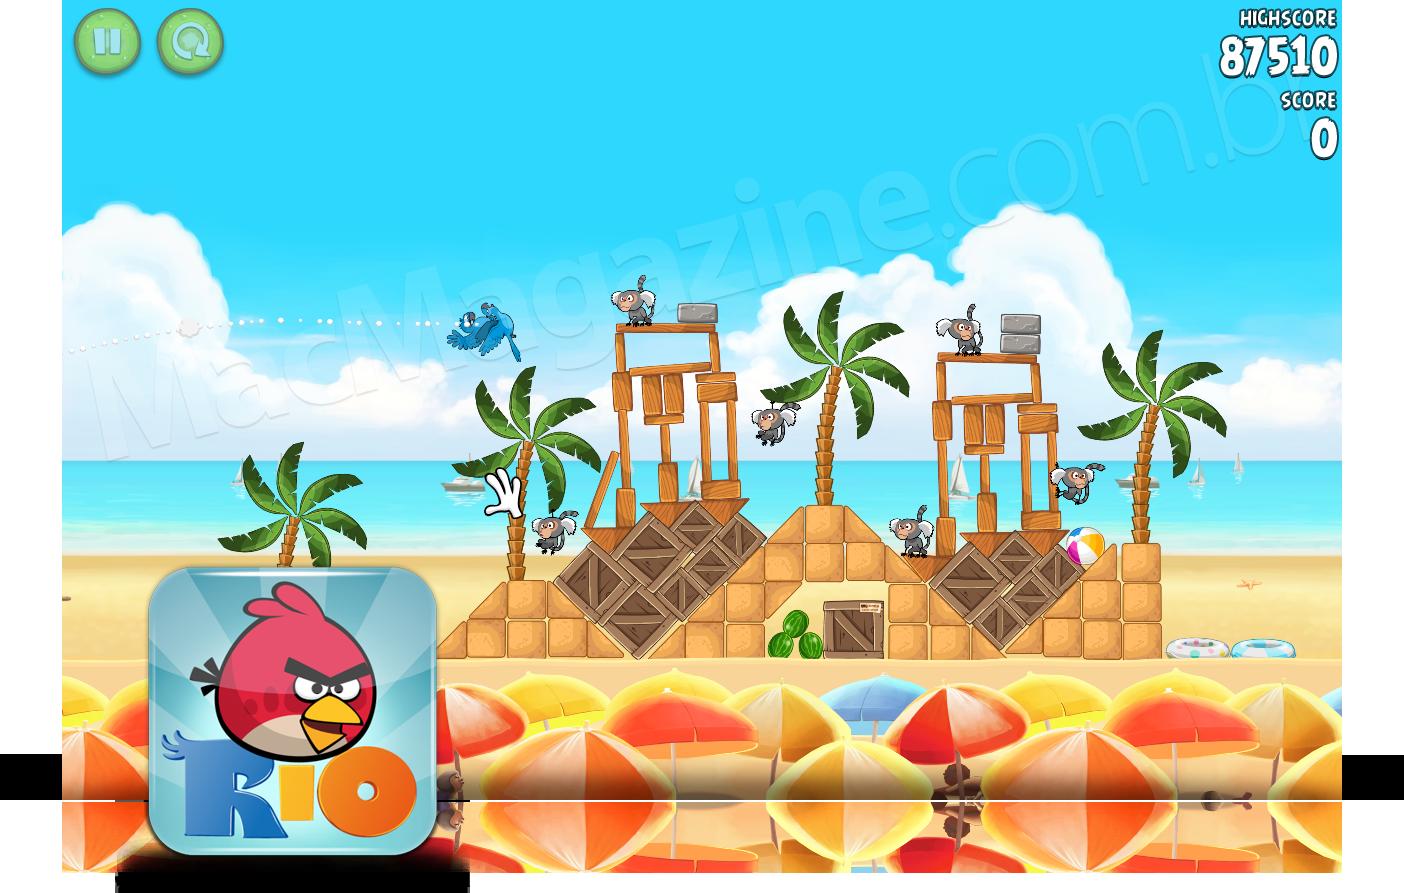 Angry Birds Rio 1.1 no Mac